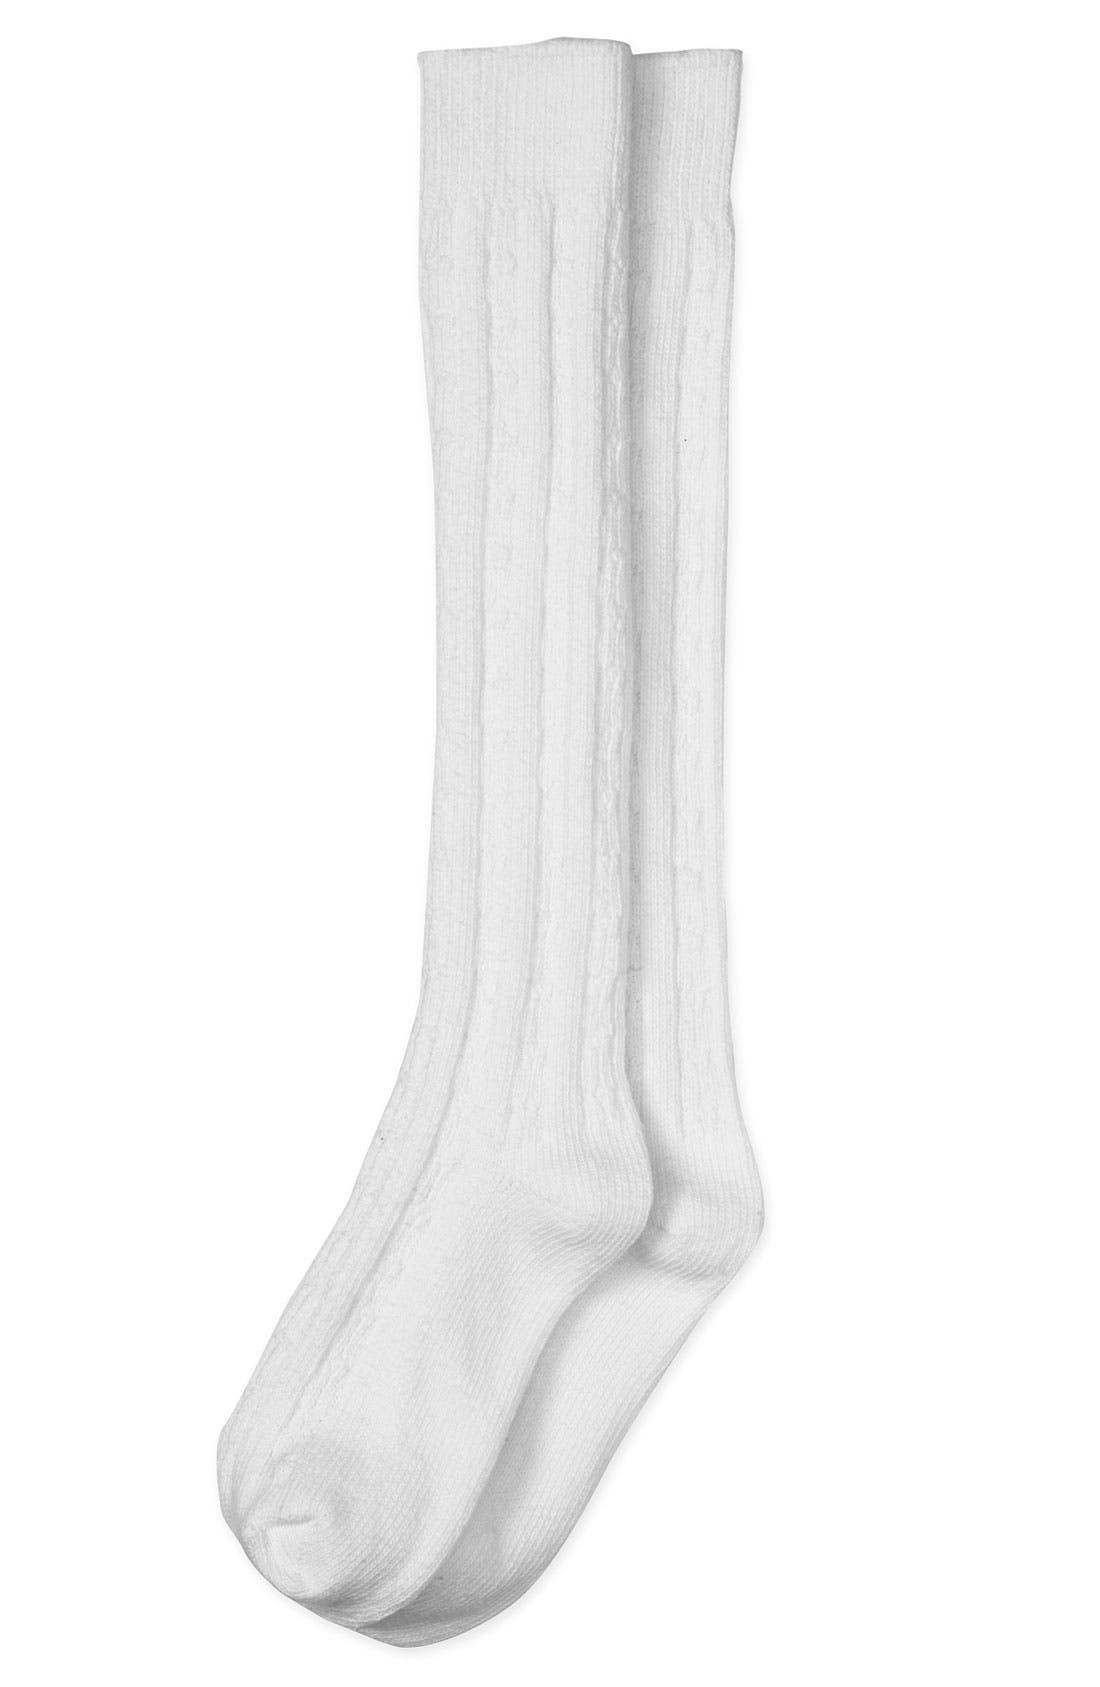 Alternate Image 1 Selected - Nordstrom Cable Knit Knee High Socks (2-Pack) (Girls)